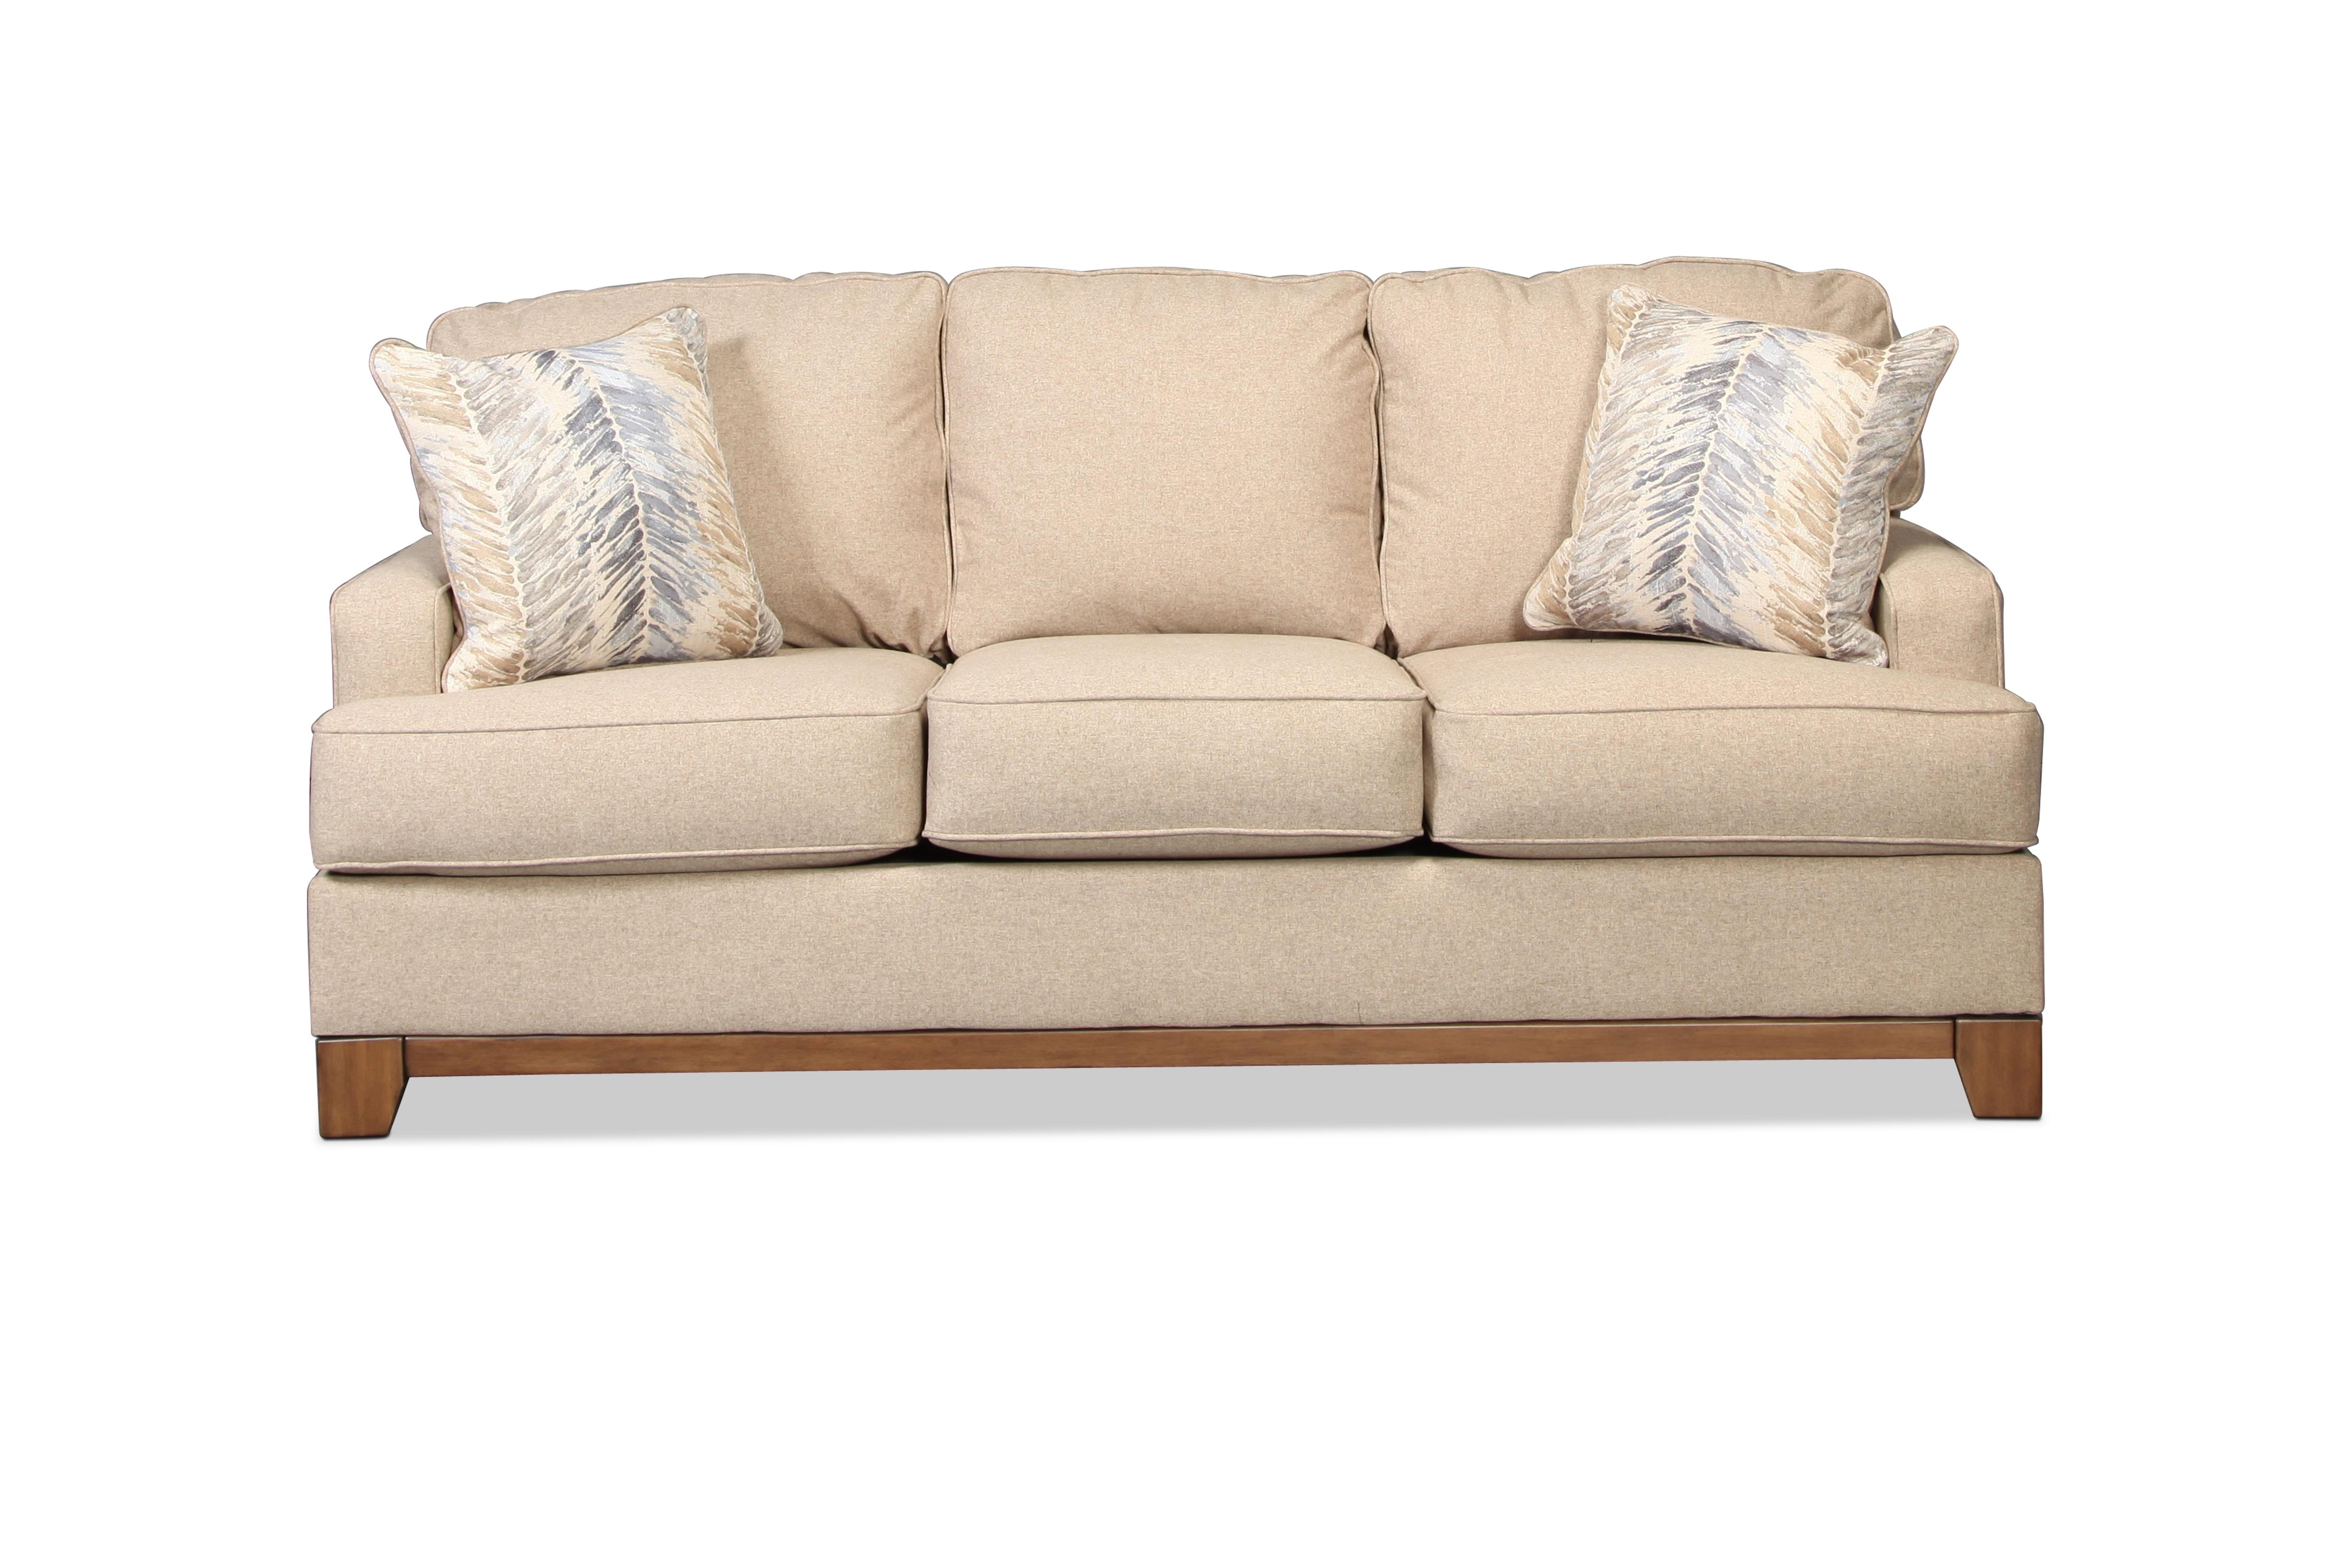 Eisley Sofa - Pebble